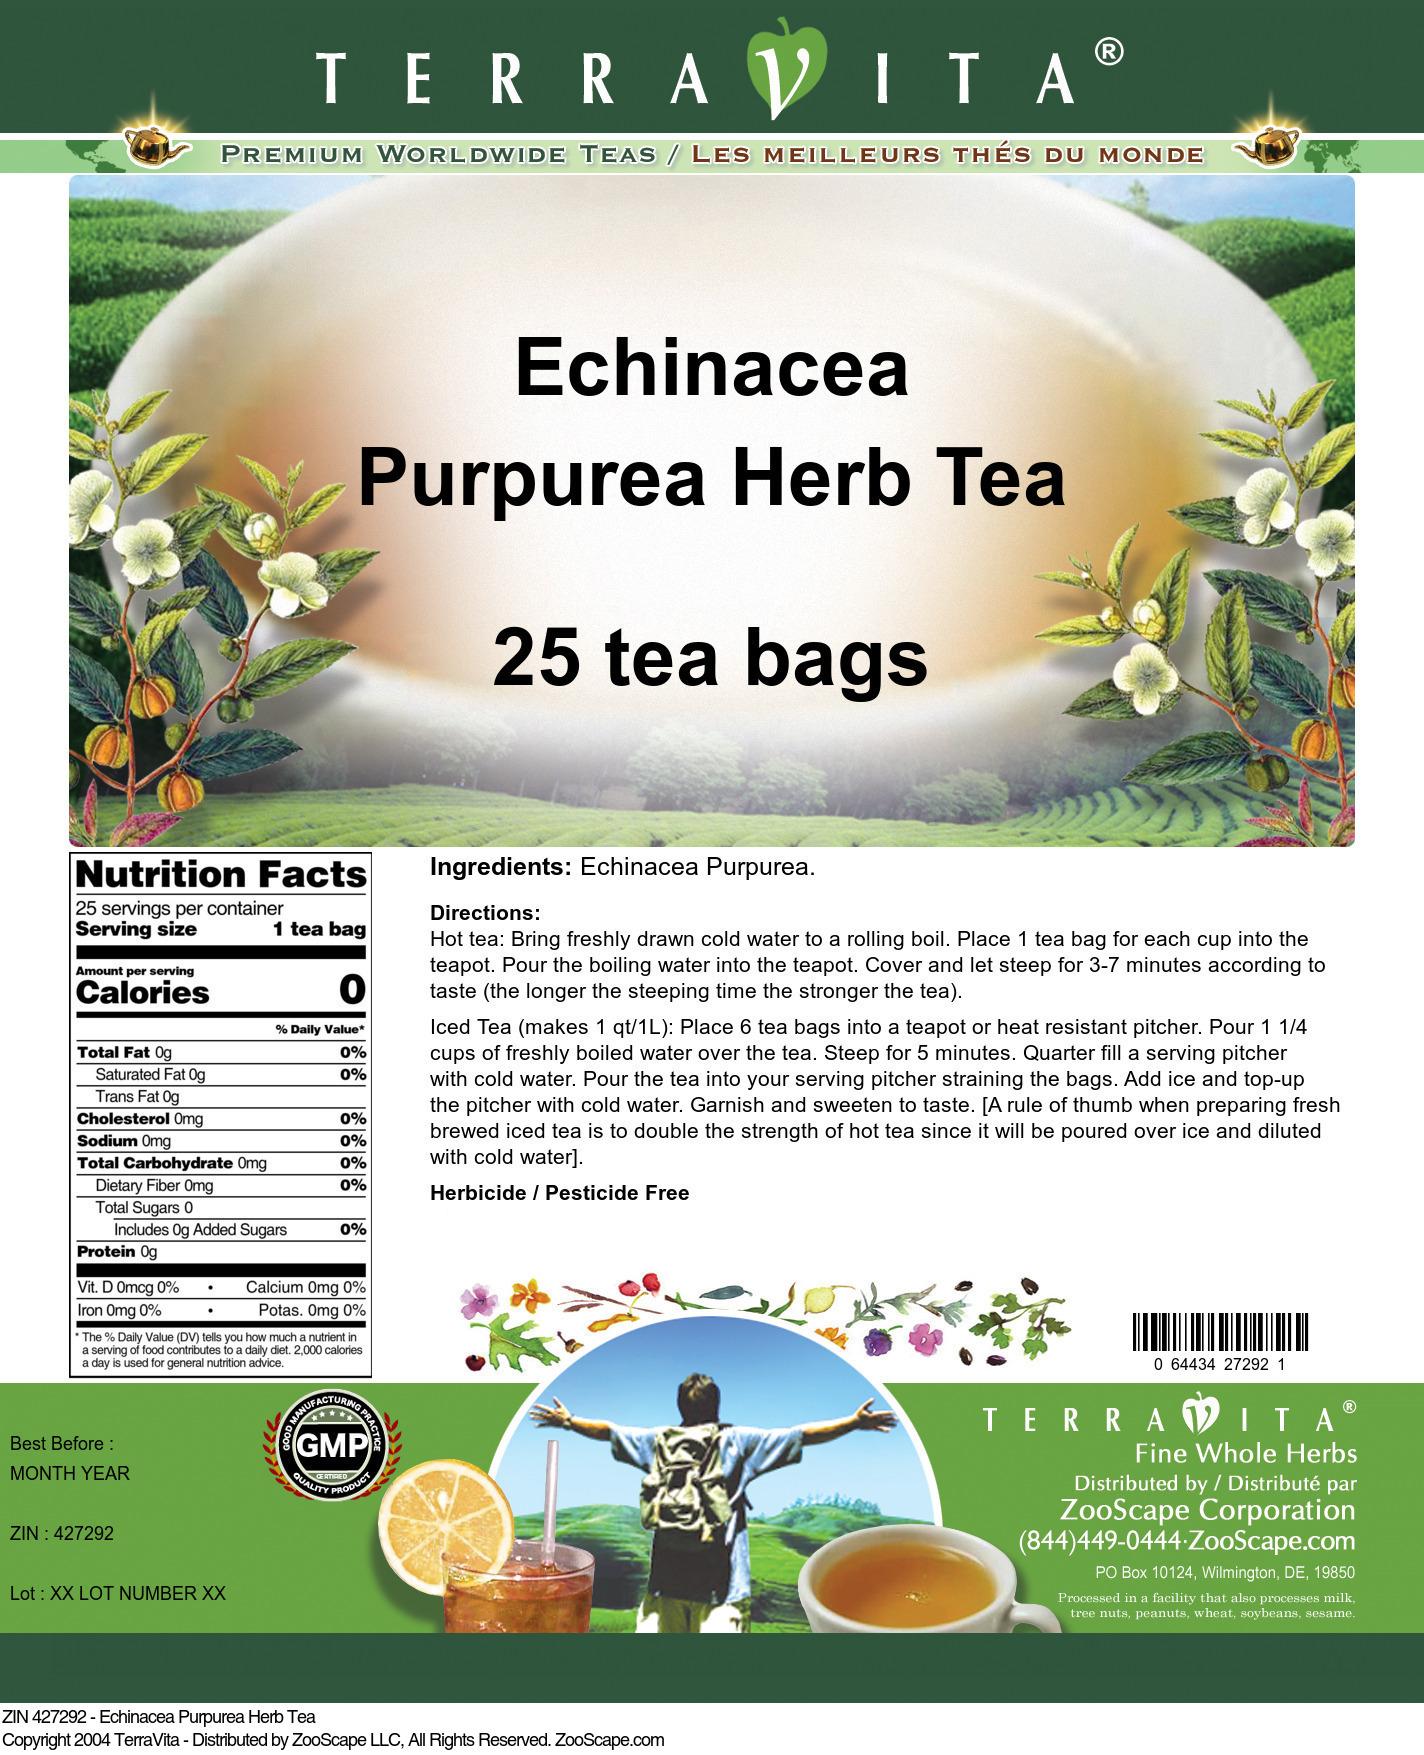 Echinacea Purpurea Herb Tea